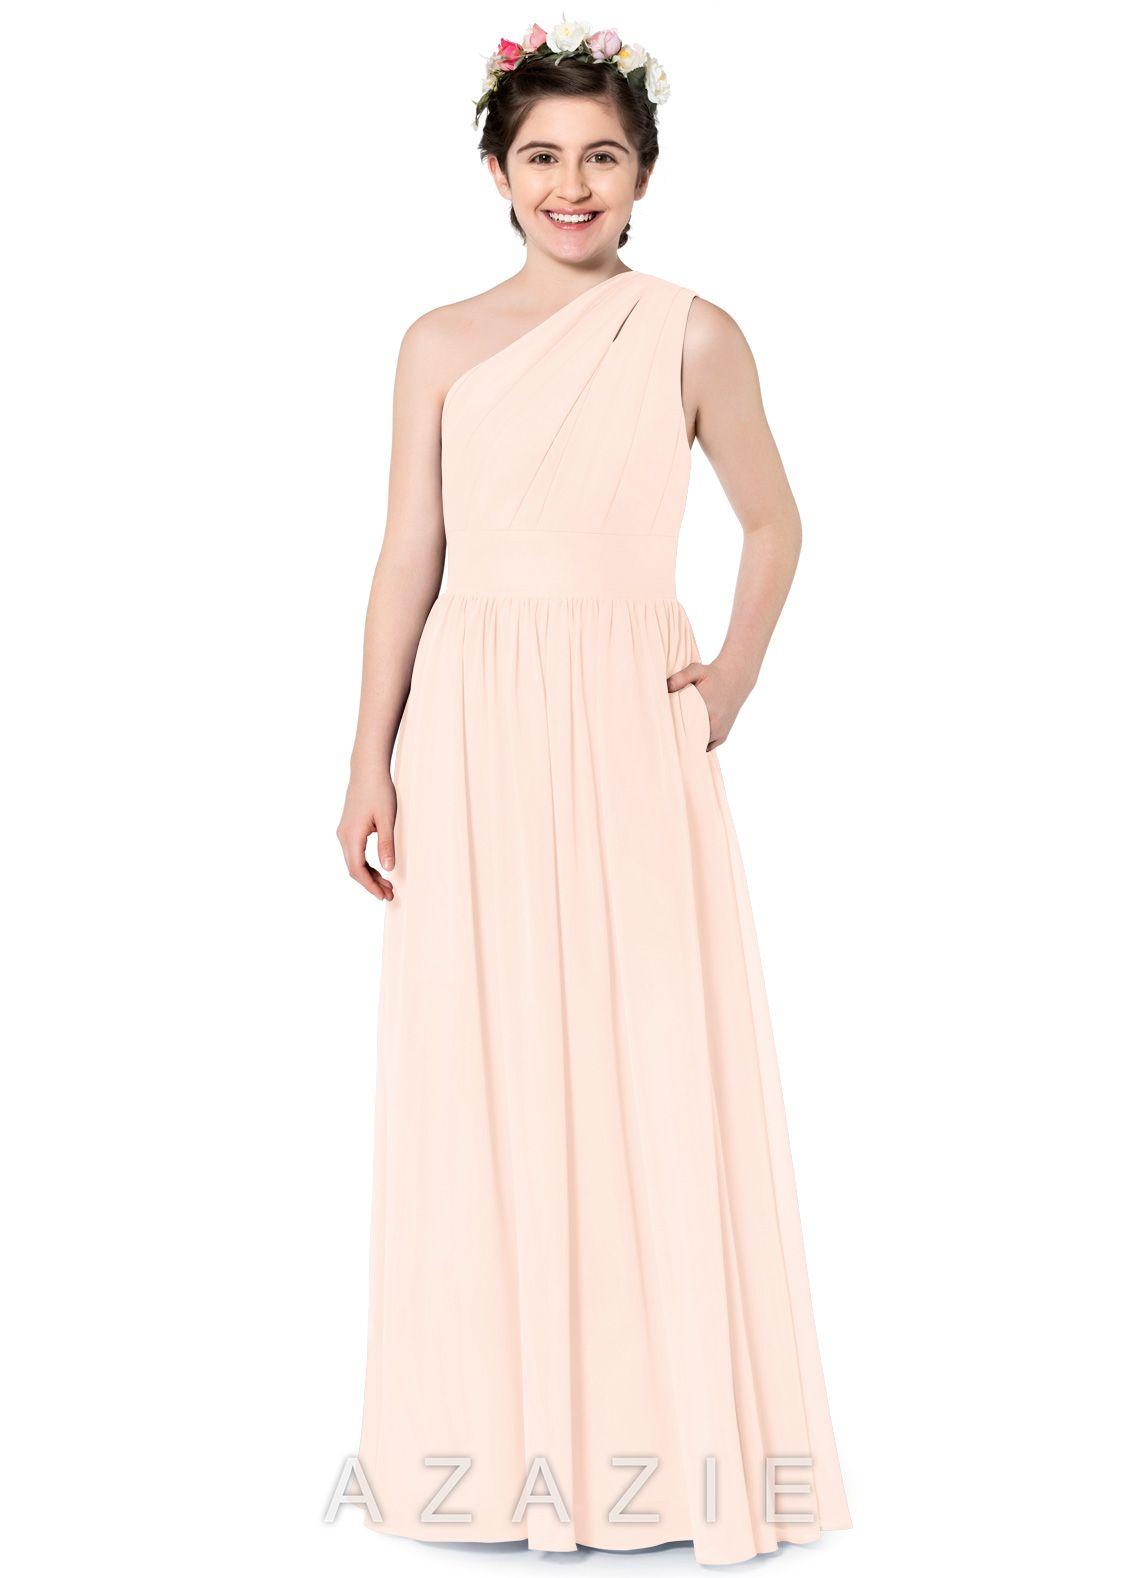 914bccd6a9 Azazie Molly JBD Junior Bridesmaid Dress